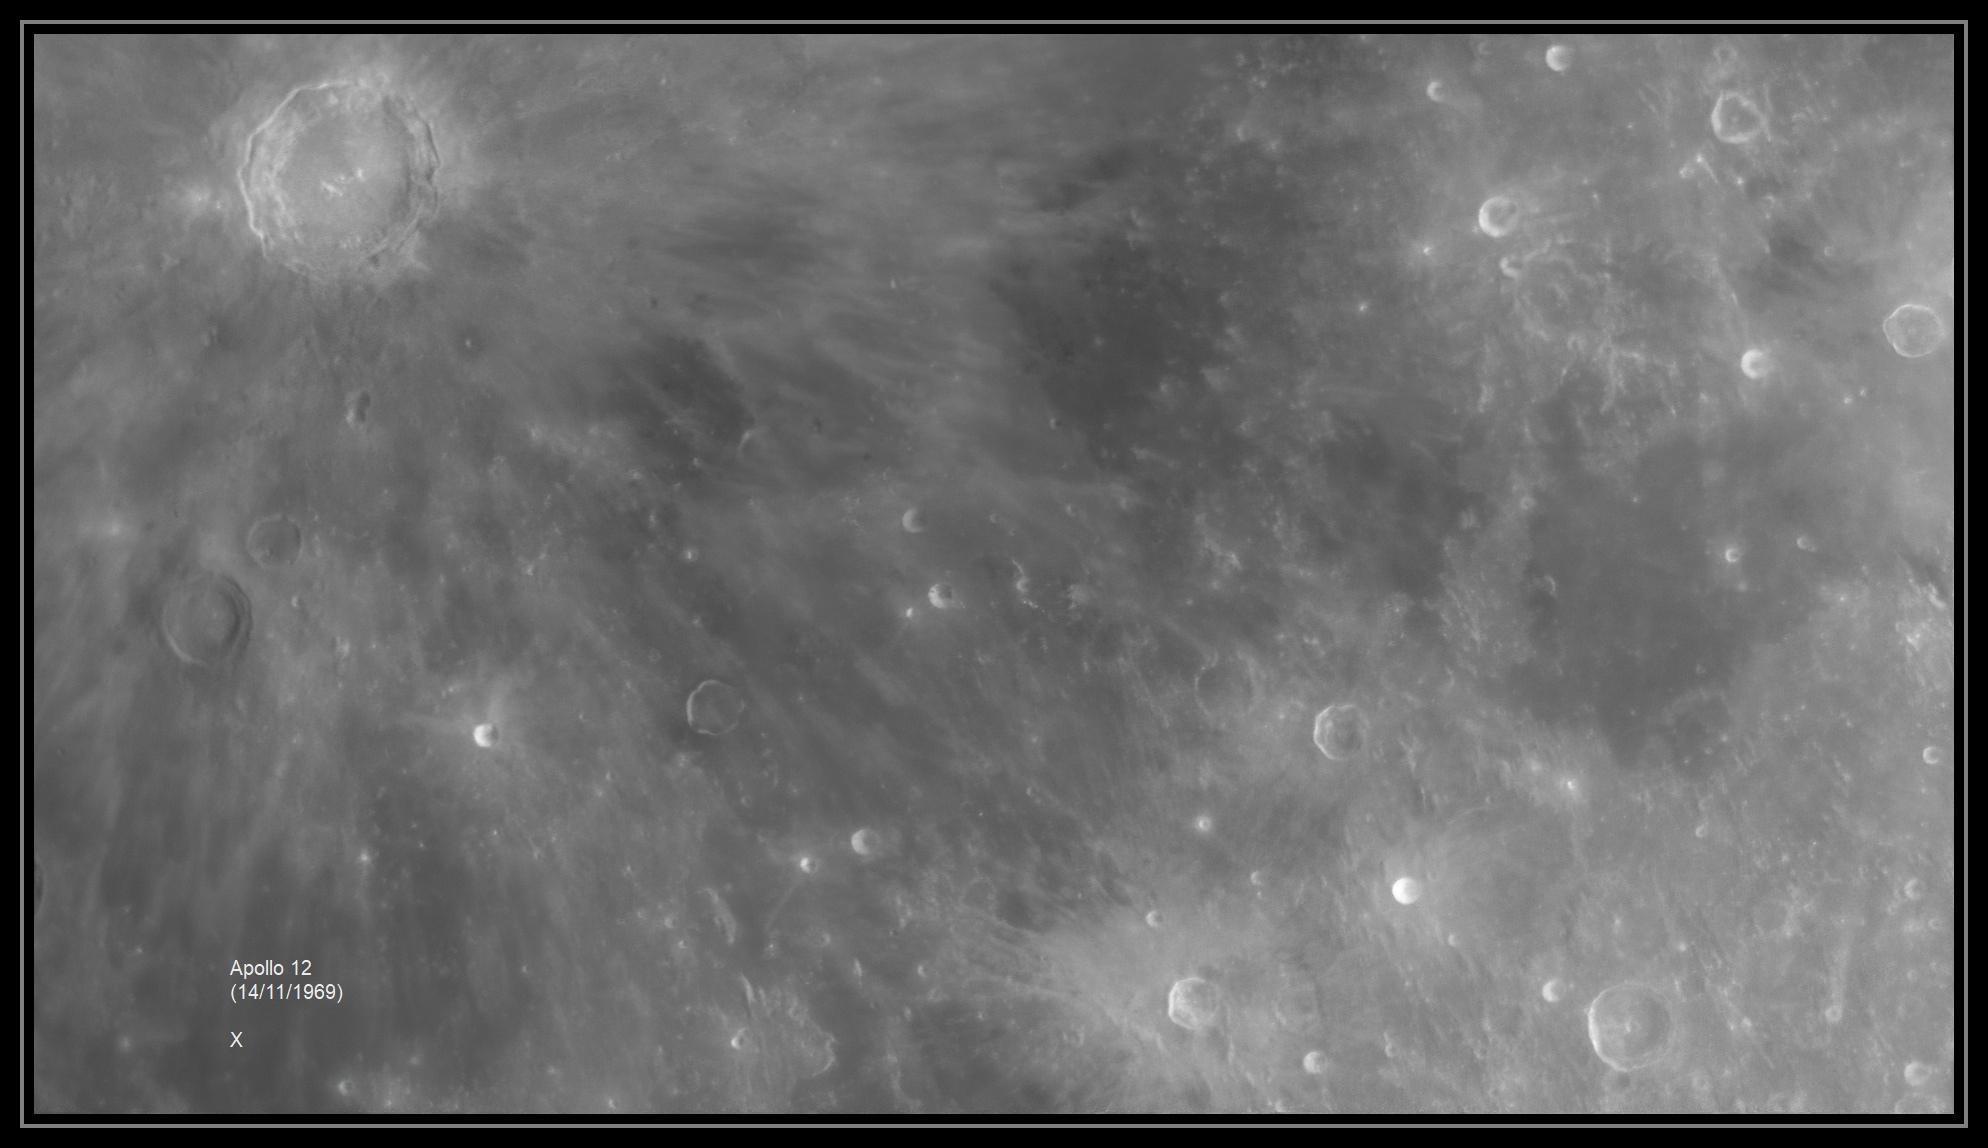 5e4857b914afb_Moon_215154_060220_ZWOASI290MM_B_AS_P35_lapl4_ap1454-Apollo12.jpg.8de45237fba7dd17c19b901d3b3e77b3.jpg